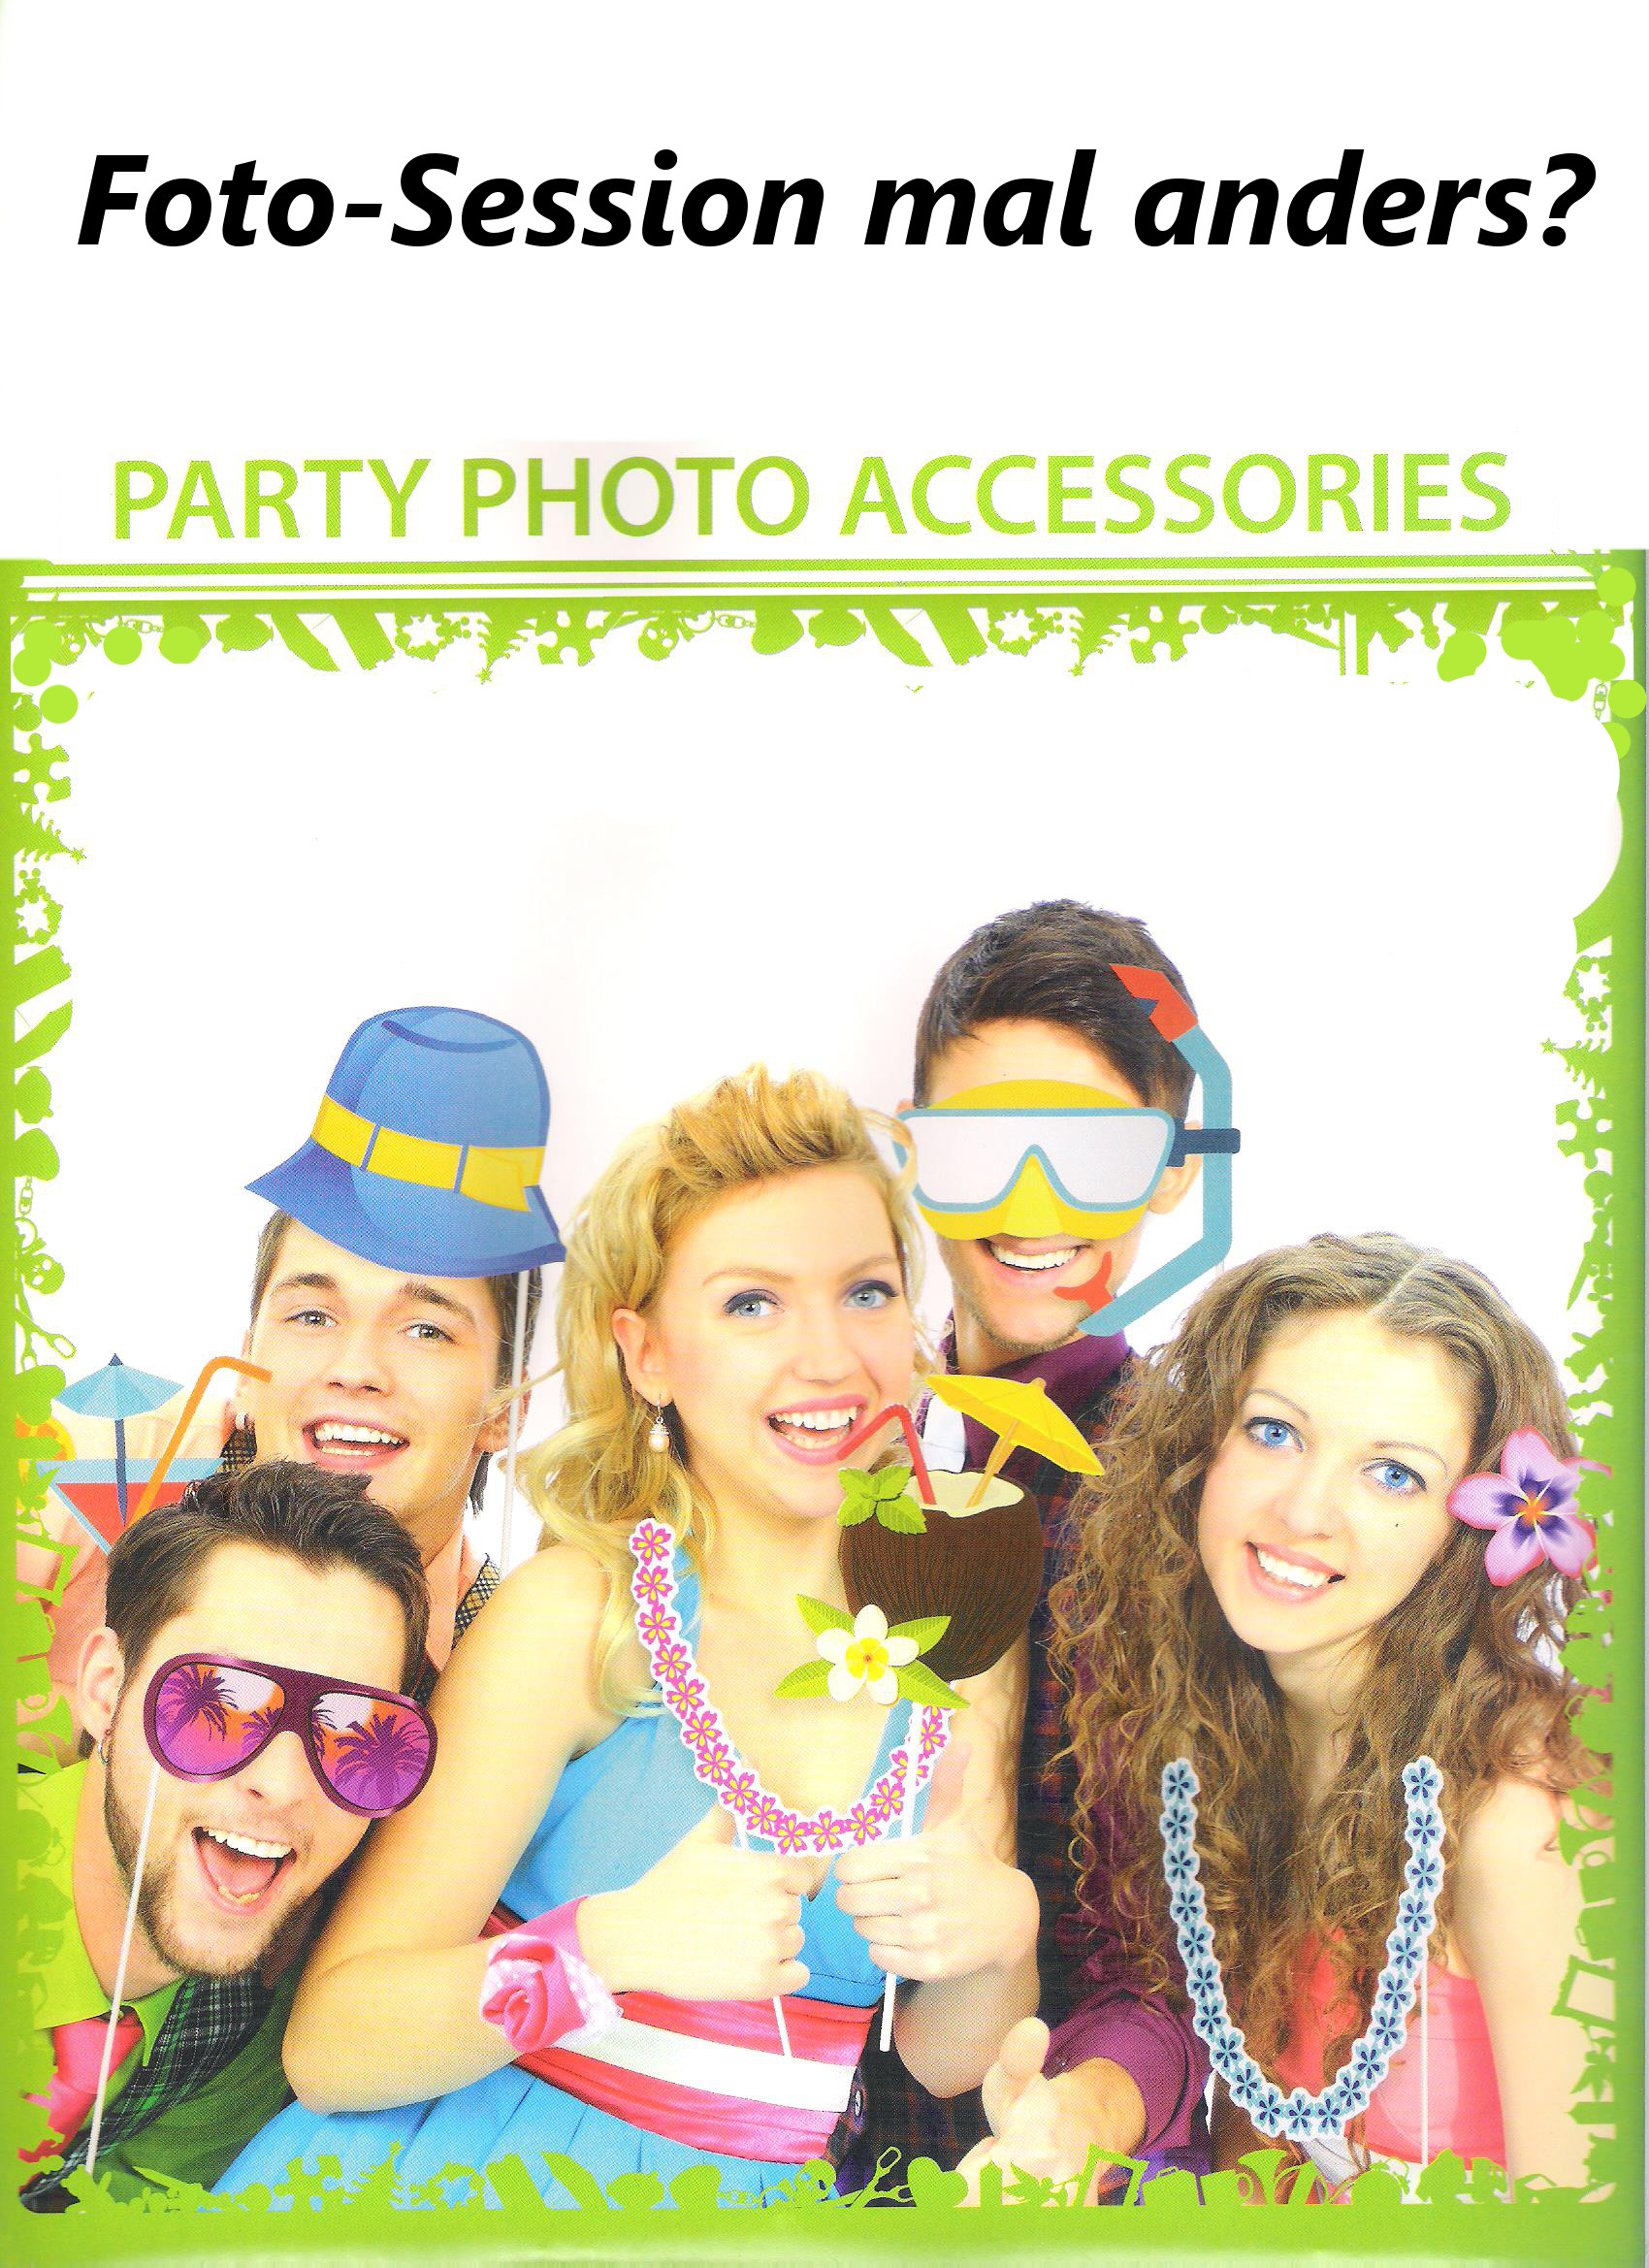 Www.party-Schatzkiste.de - Fotoverkleidung, Fotobox